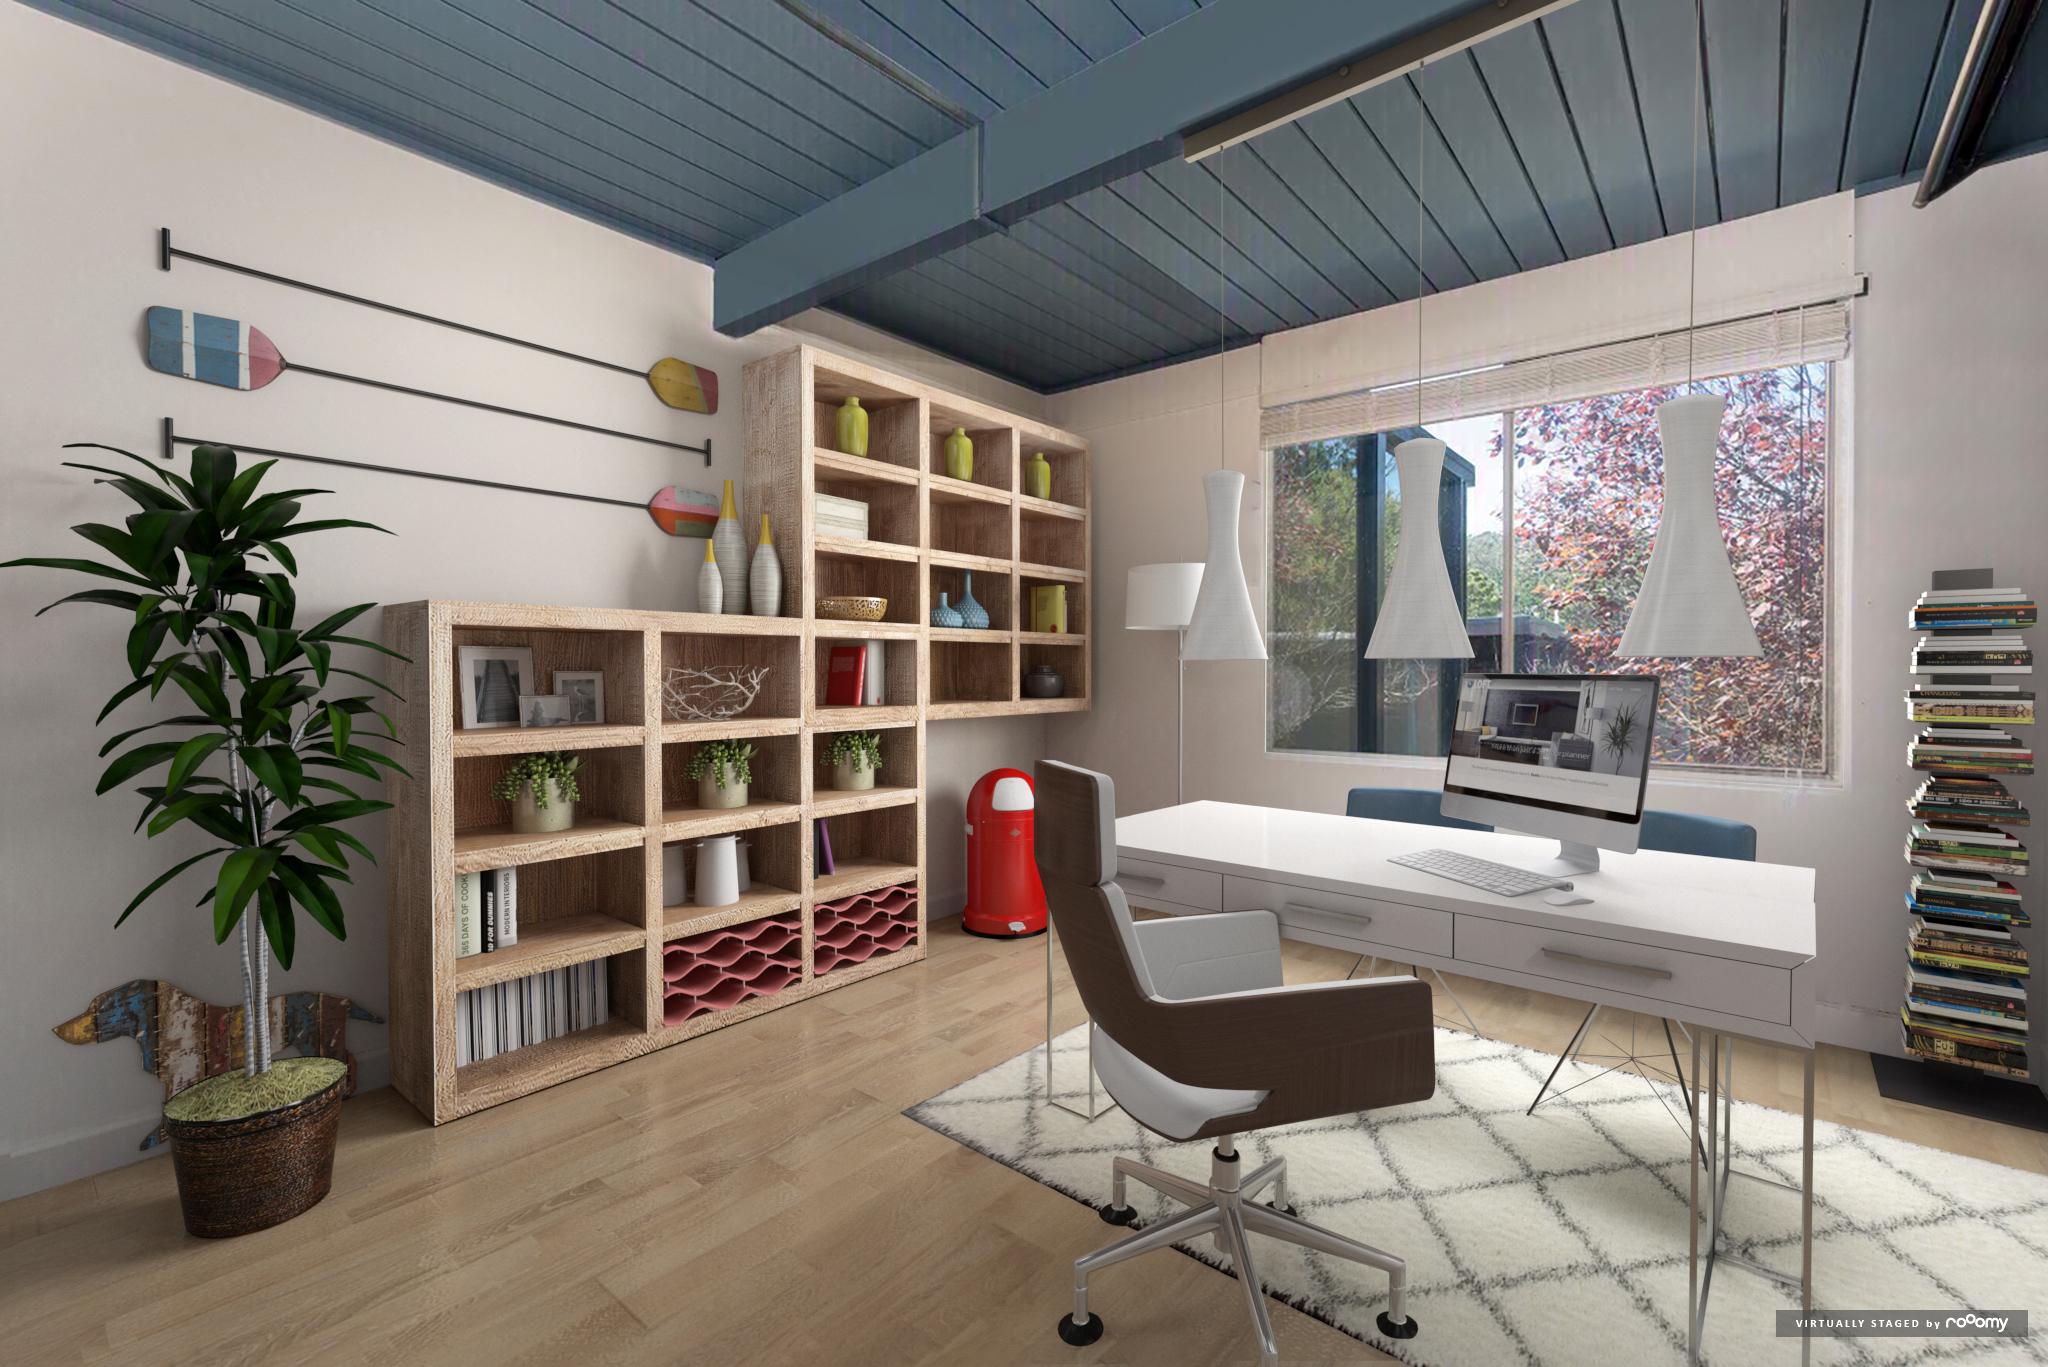 Home office with BuildDirect flooring. (Photo: roOomy)